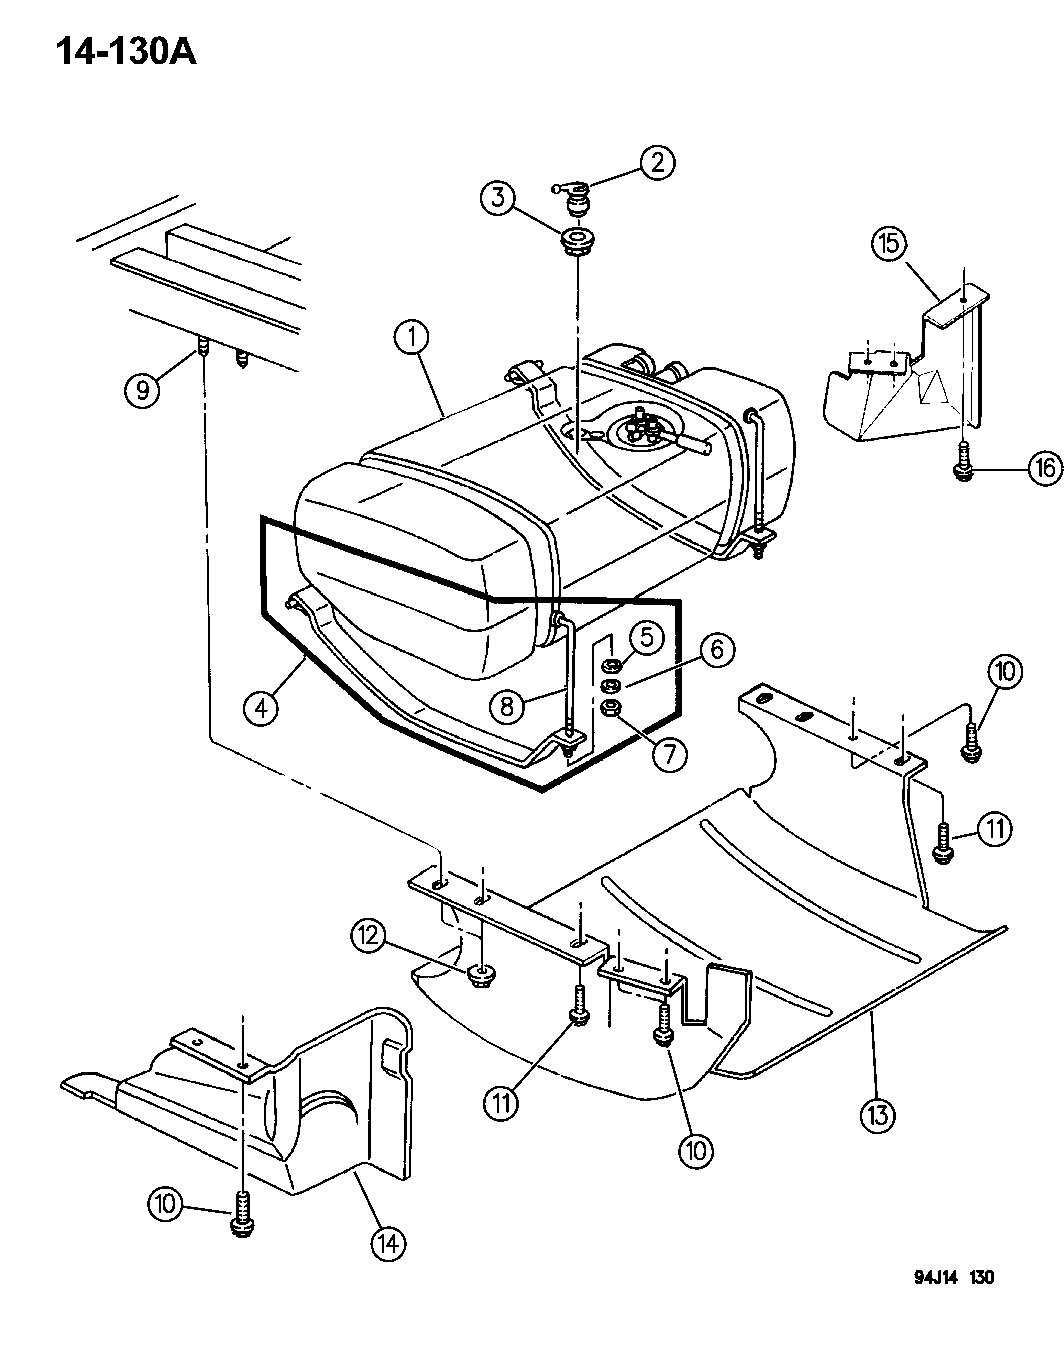 Jeep Yj Fuel Line Diagram. jeep yj fuel system diagram